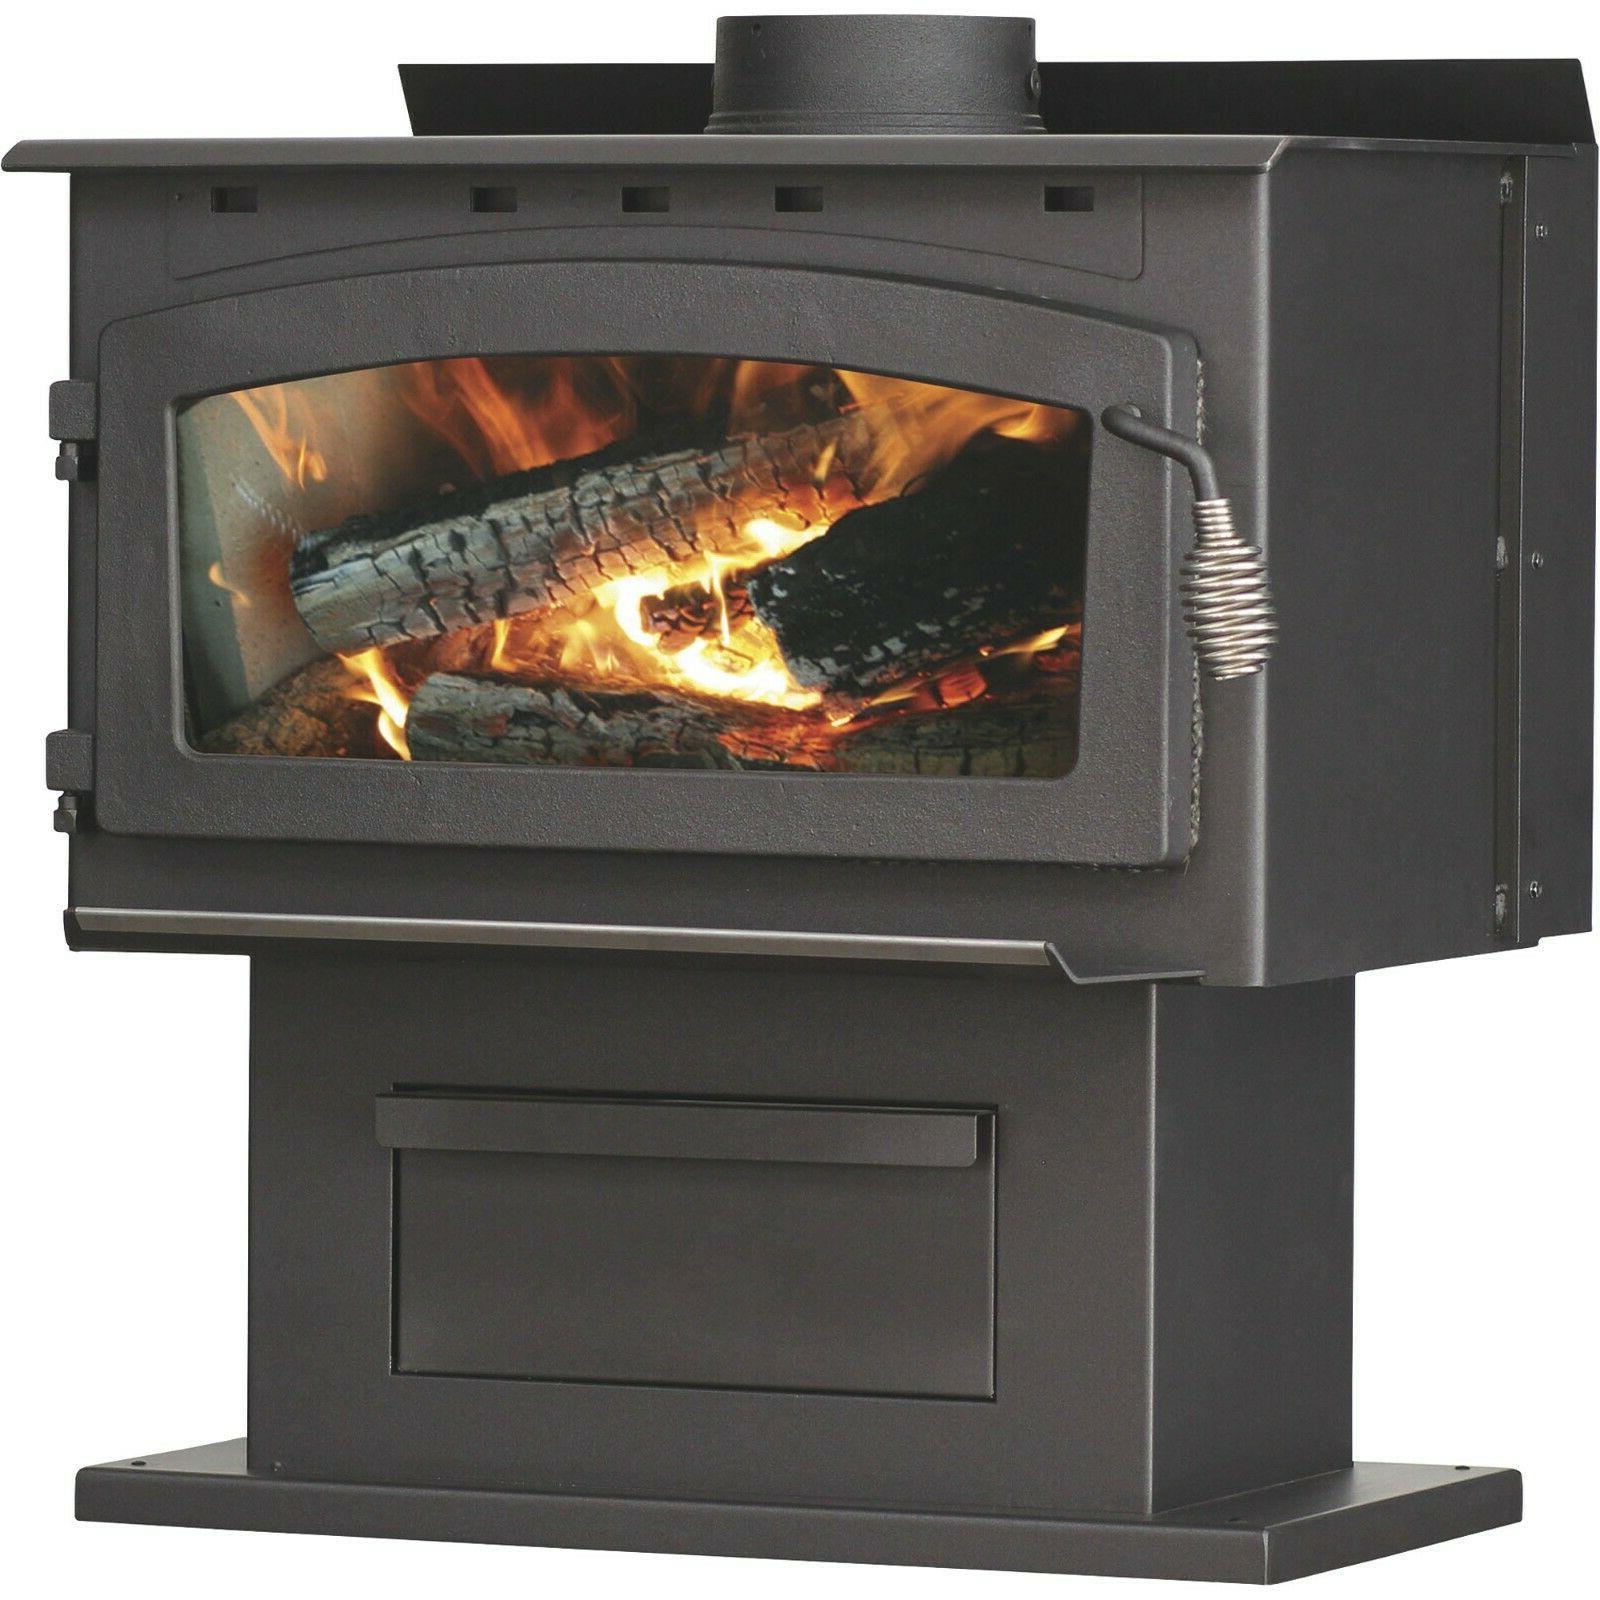 wood stove 103 000 btu epa certified